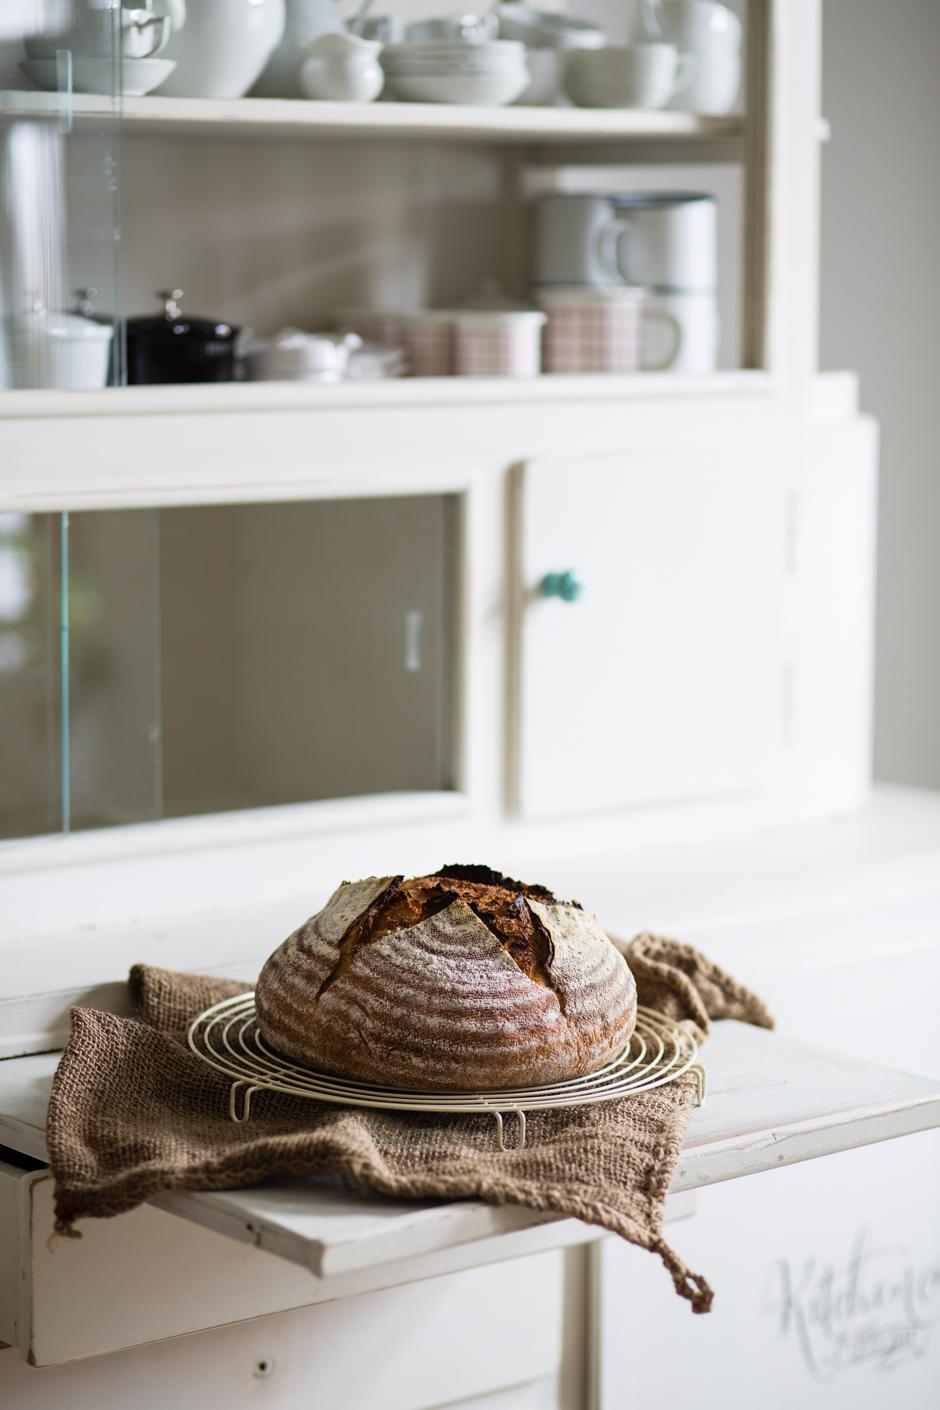 a bread lover's story www.tasteofmemories.com